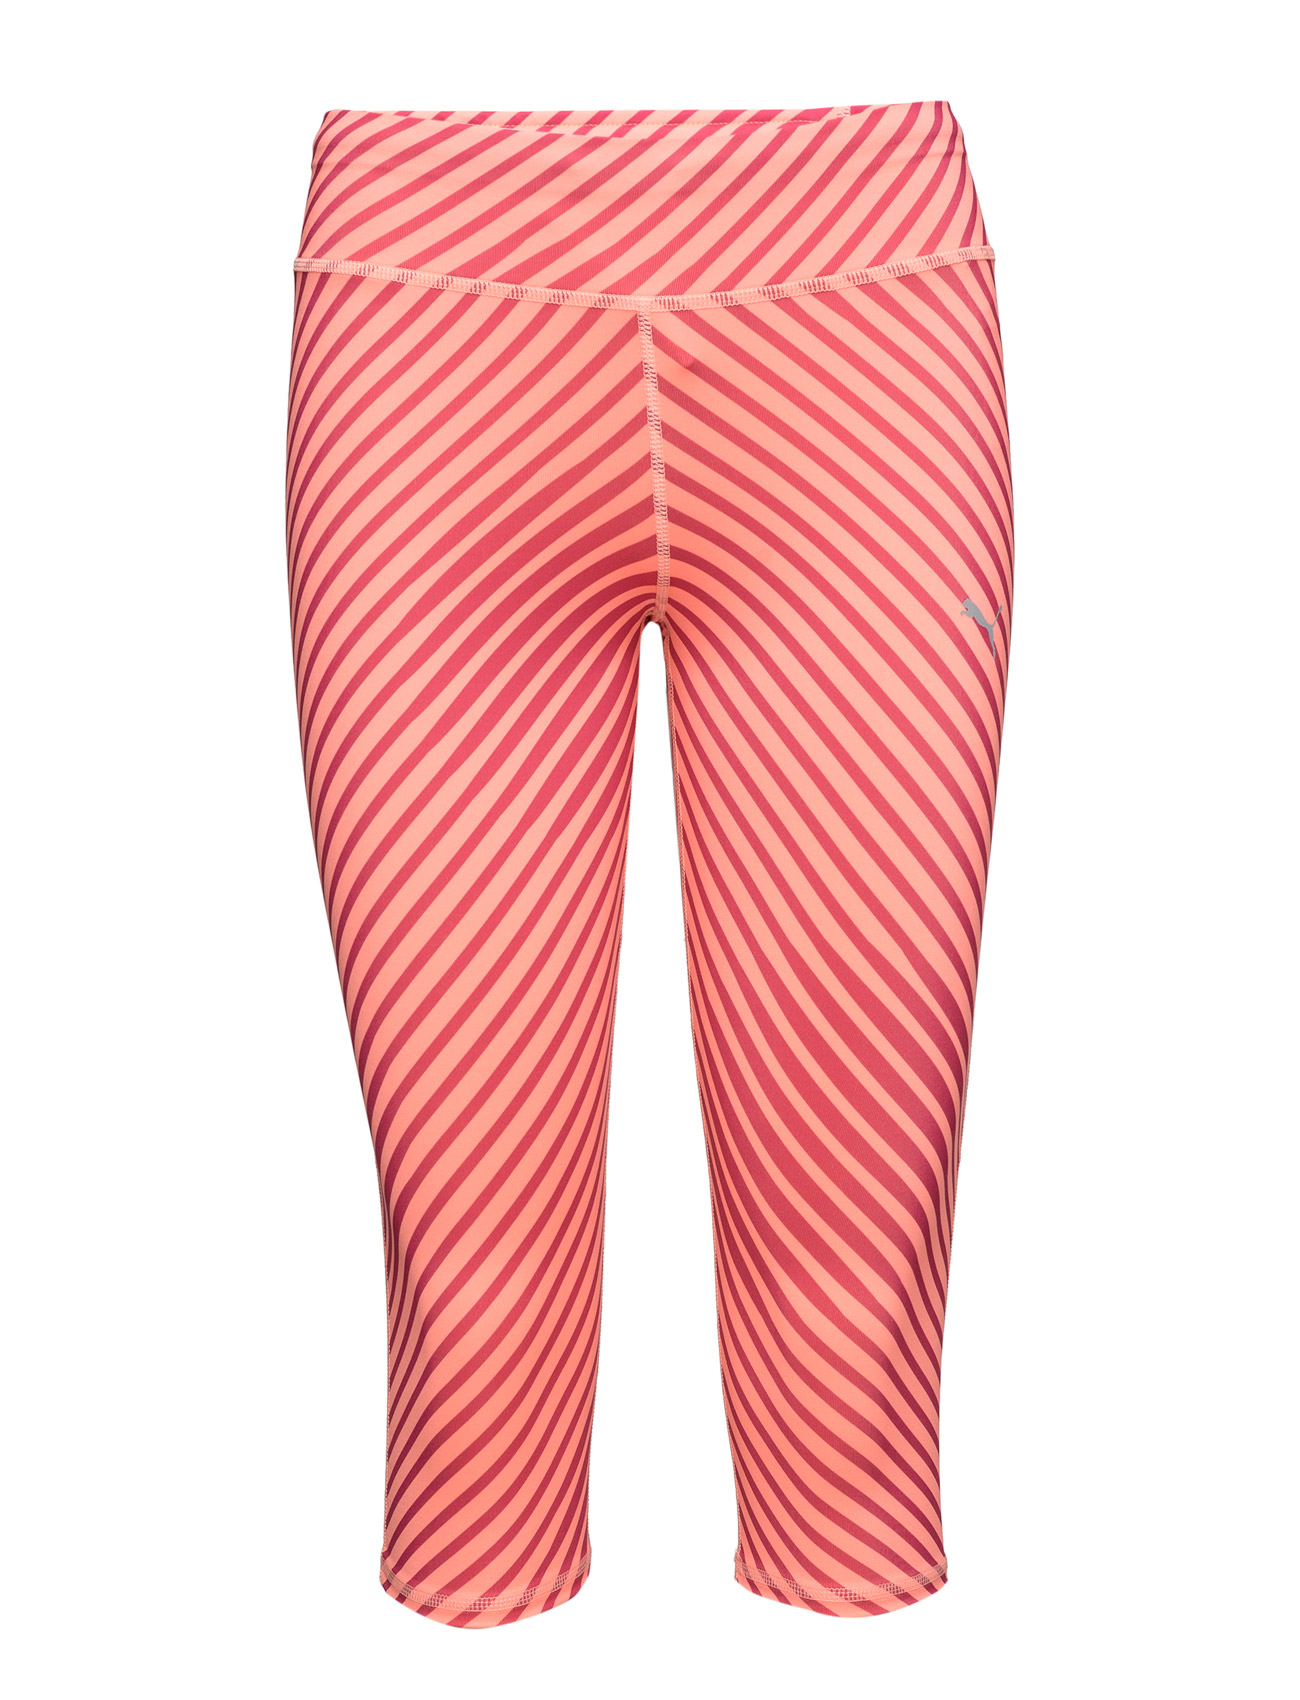 Graphic 3/4 Tight W PUMA SPORT Trænings leggings til Damer i Rød